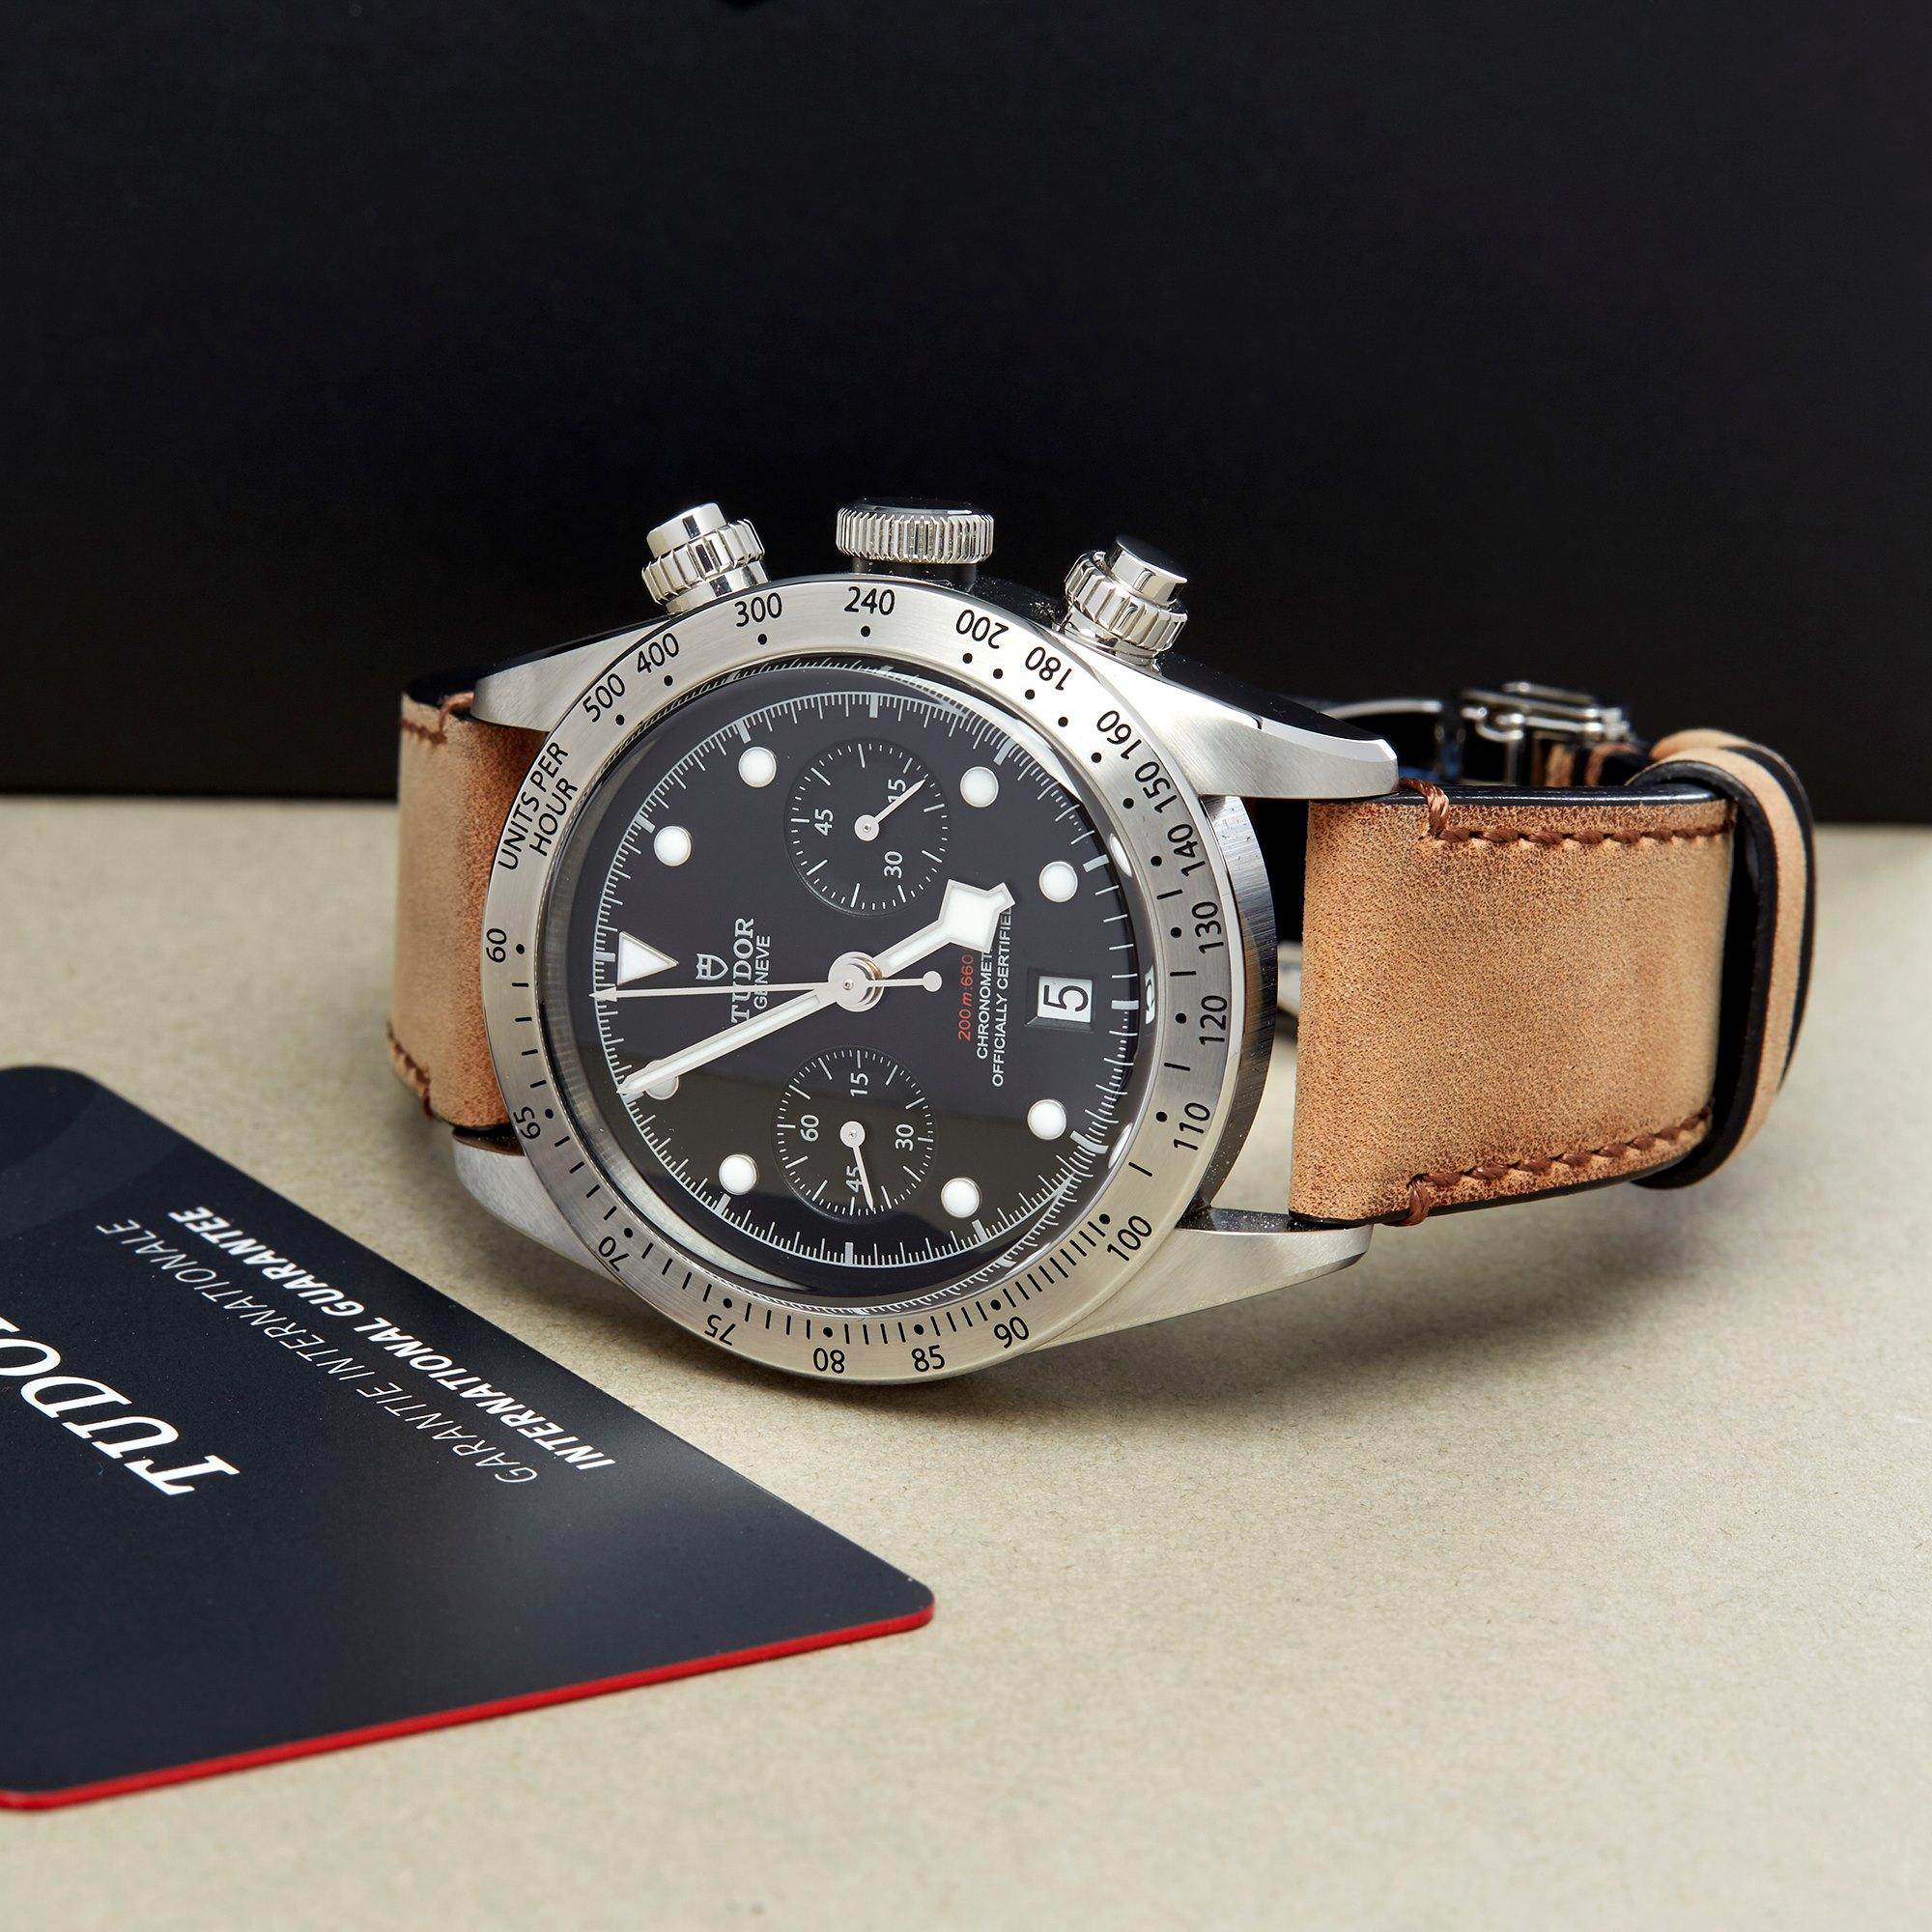 Tudor Black Bay Chronograph Stainless Steel 79350